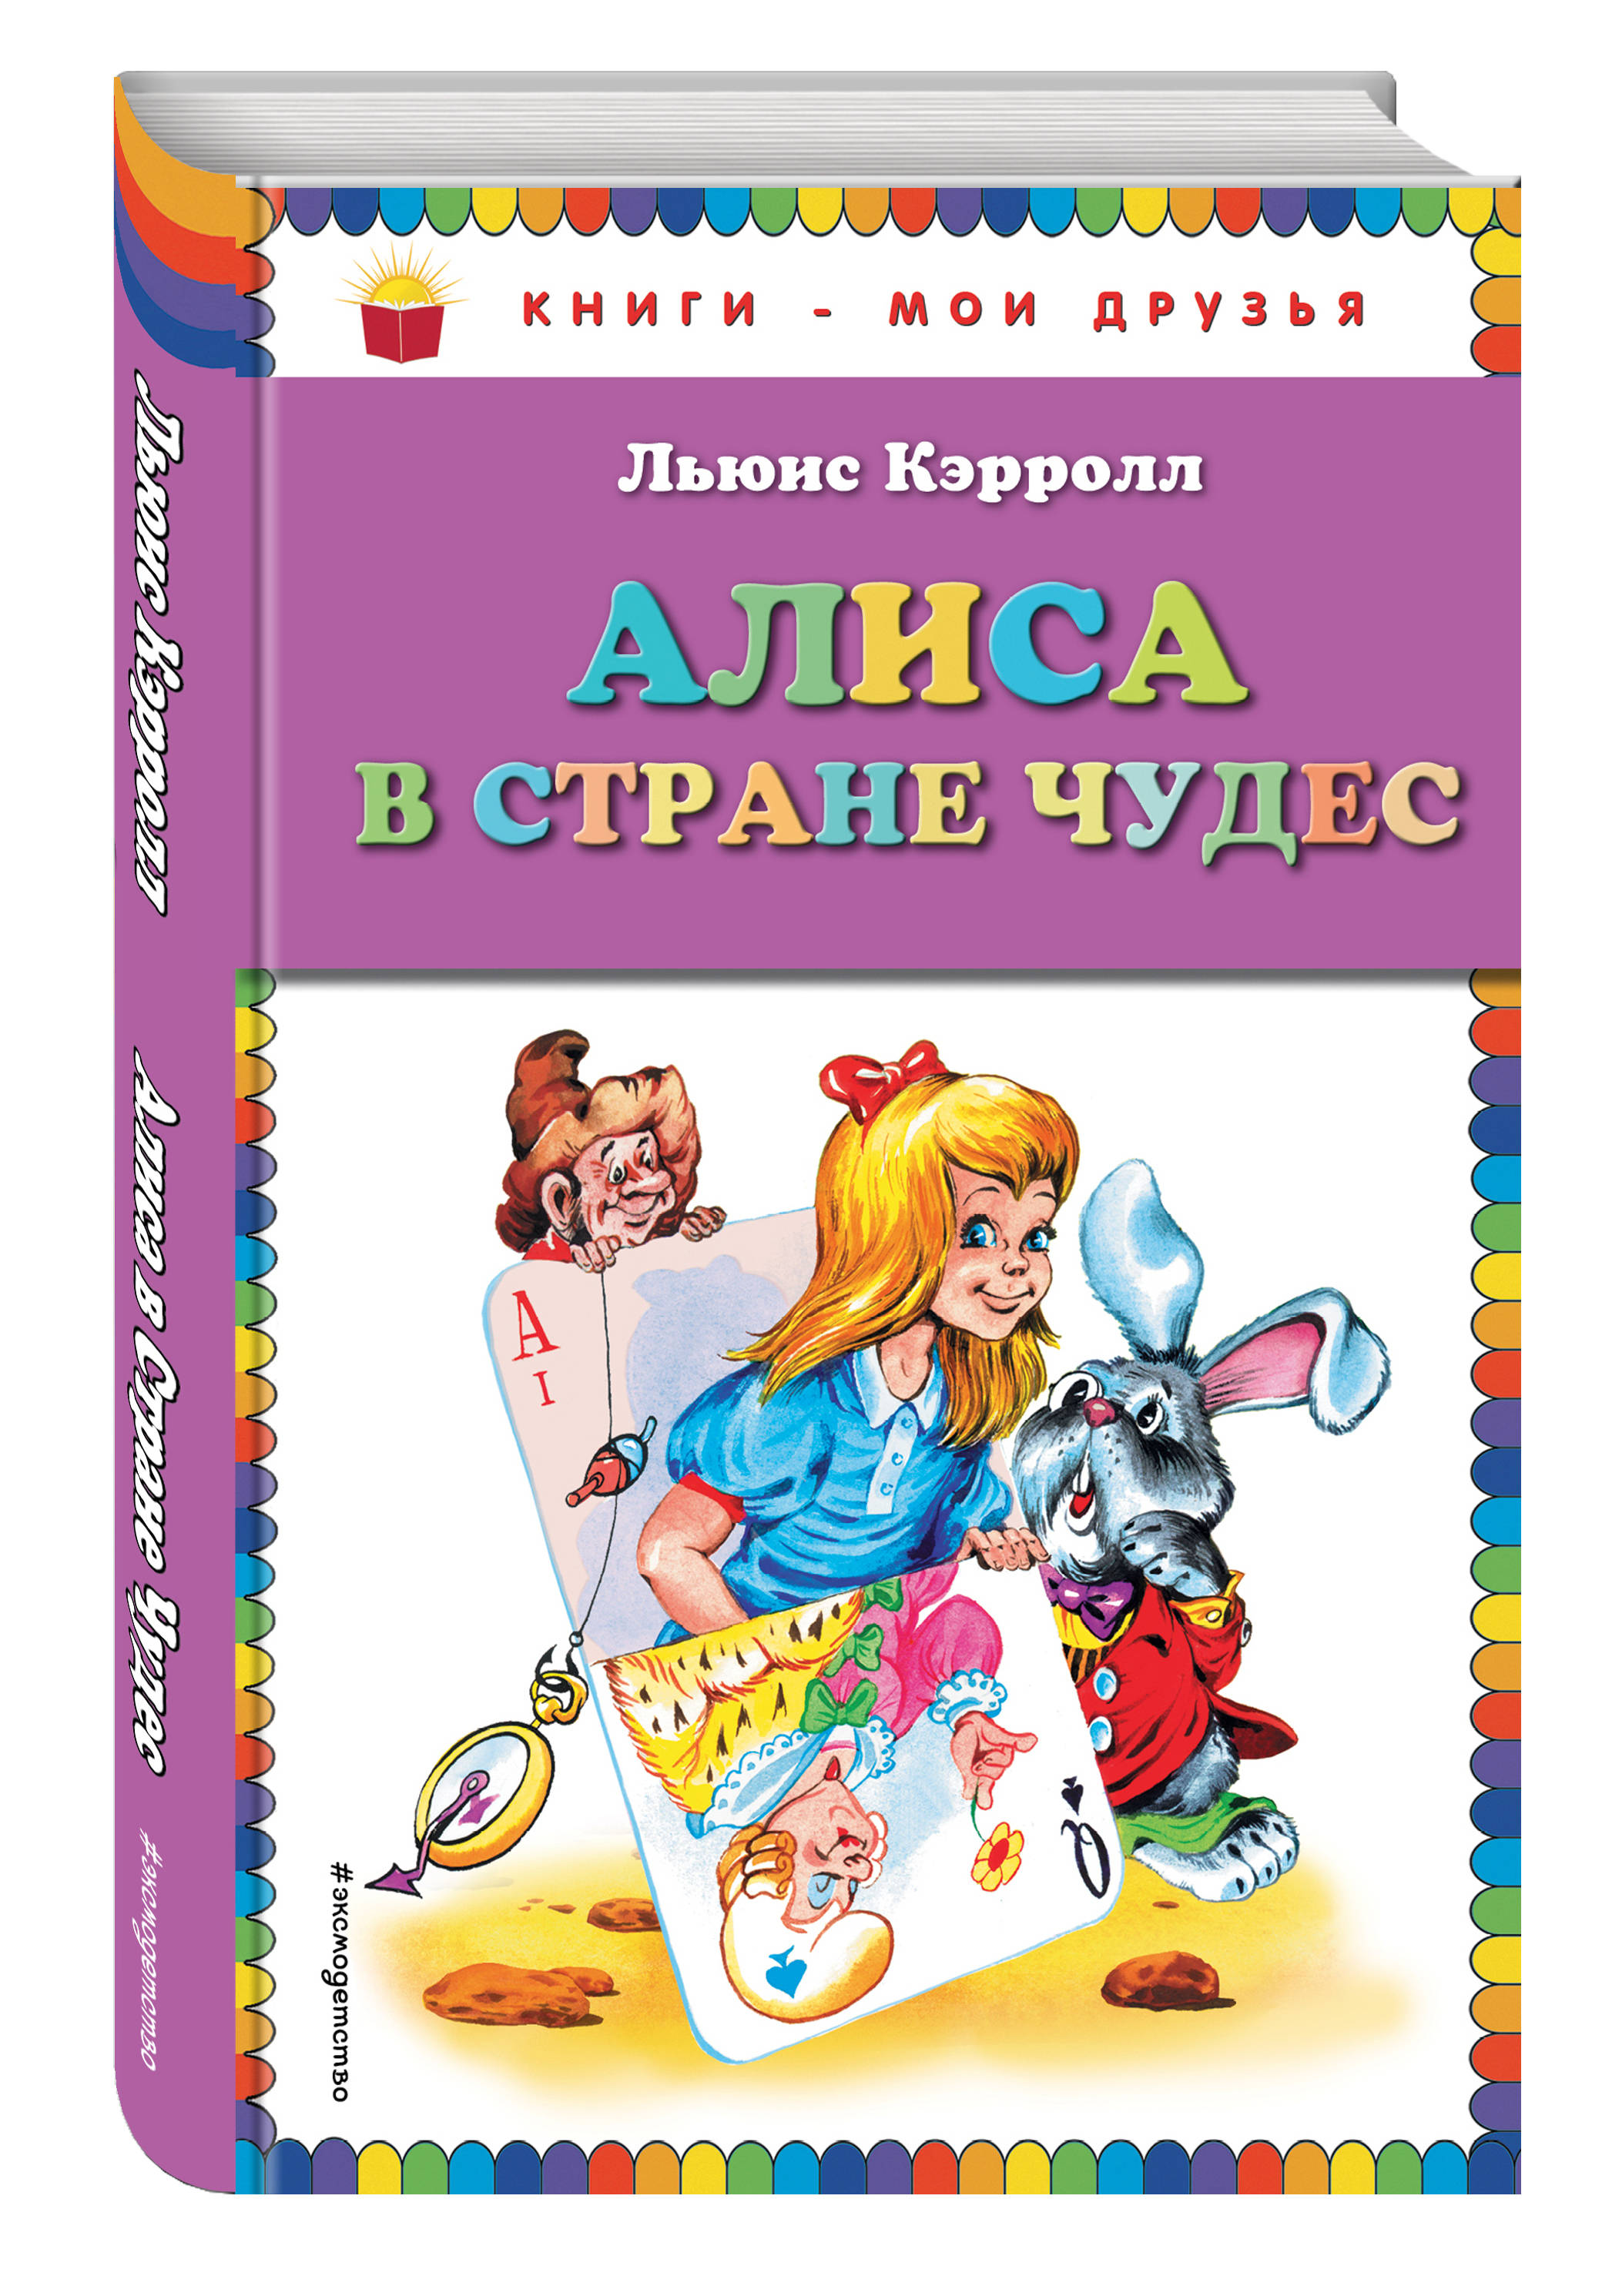 Льюис Кэрролл Алиса в Стране чудес (ил. А. Шахгелдяна) цена 2017